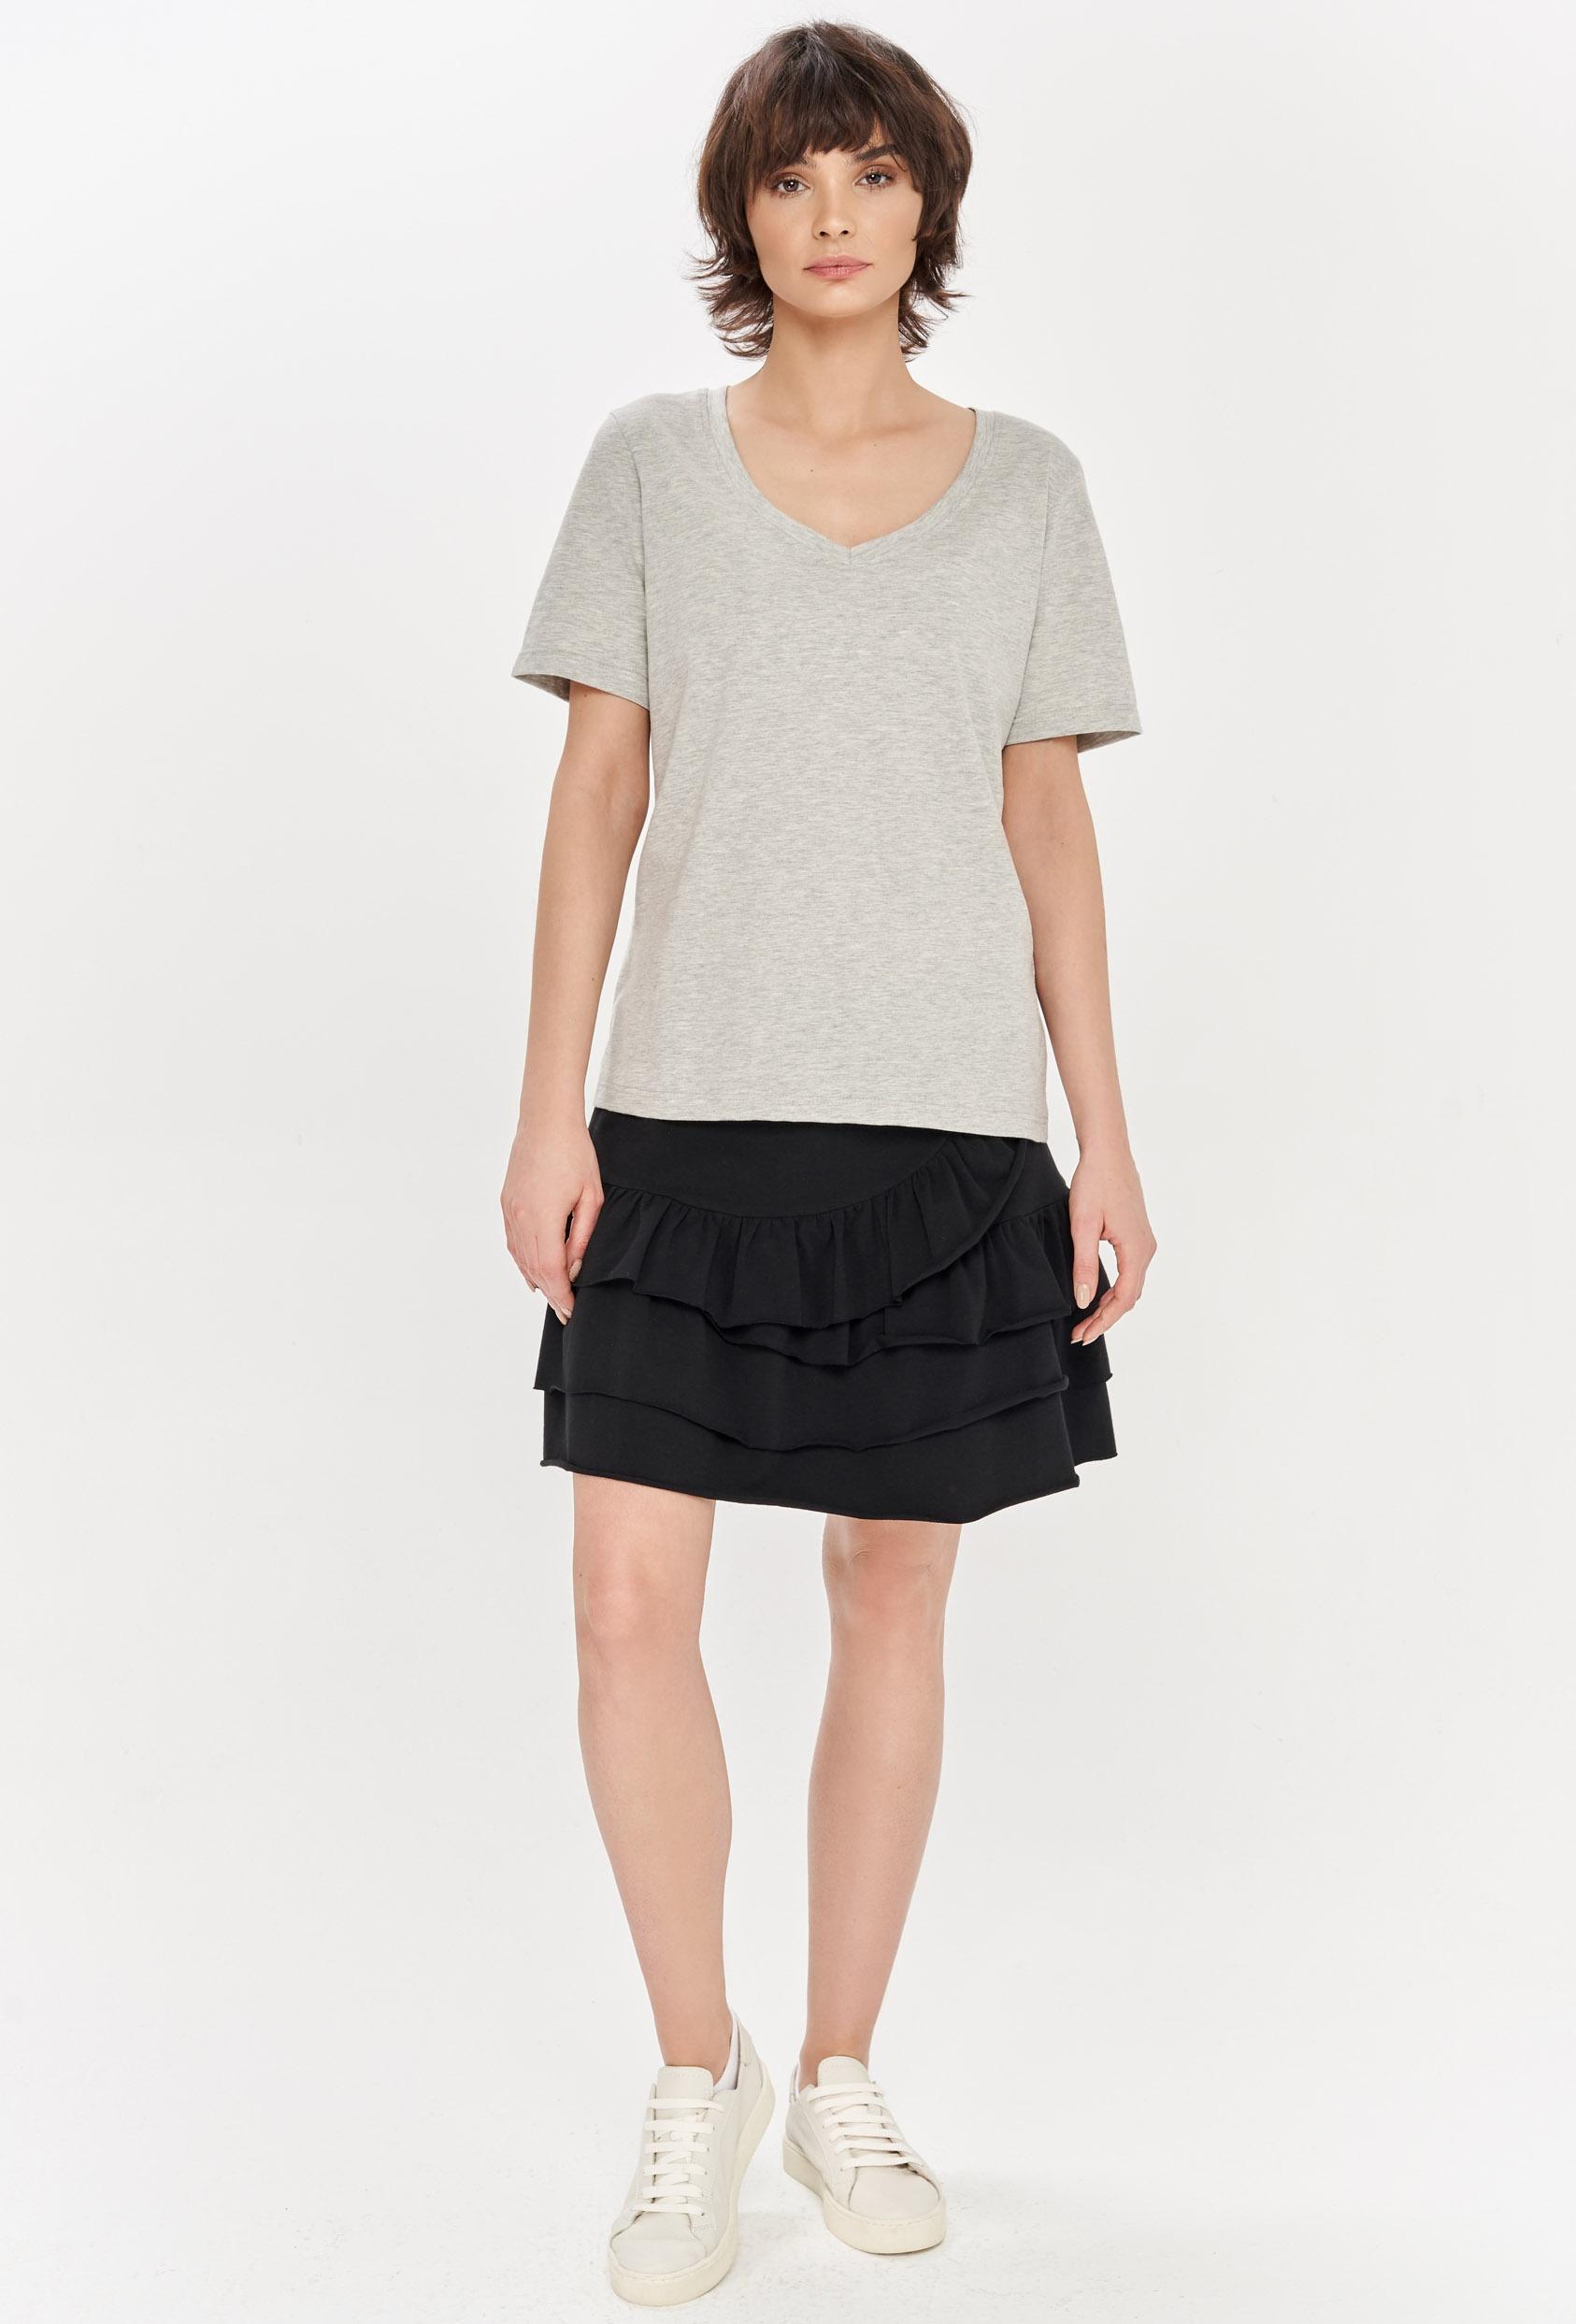 Koszulka prosta ZALIA T-SHIRT szara